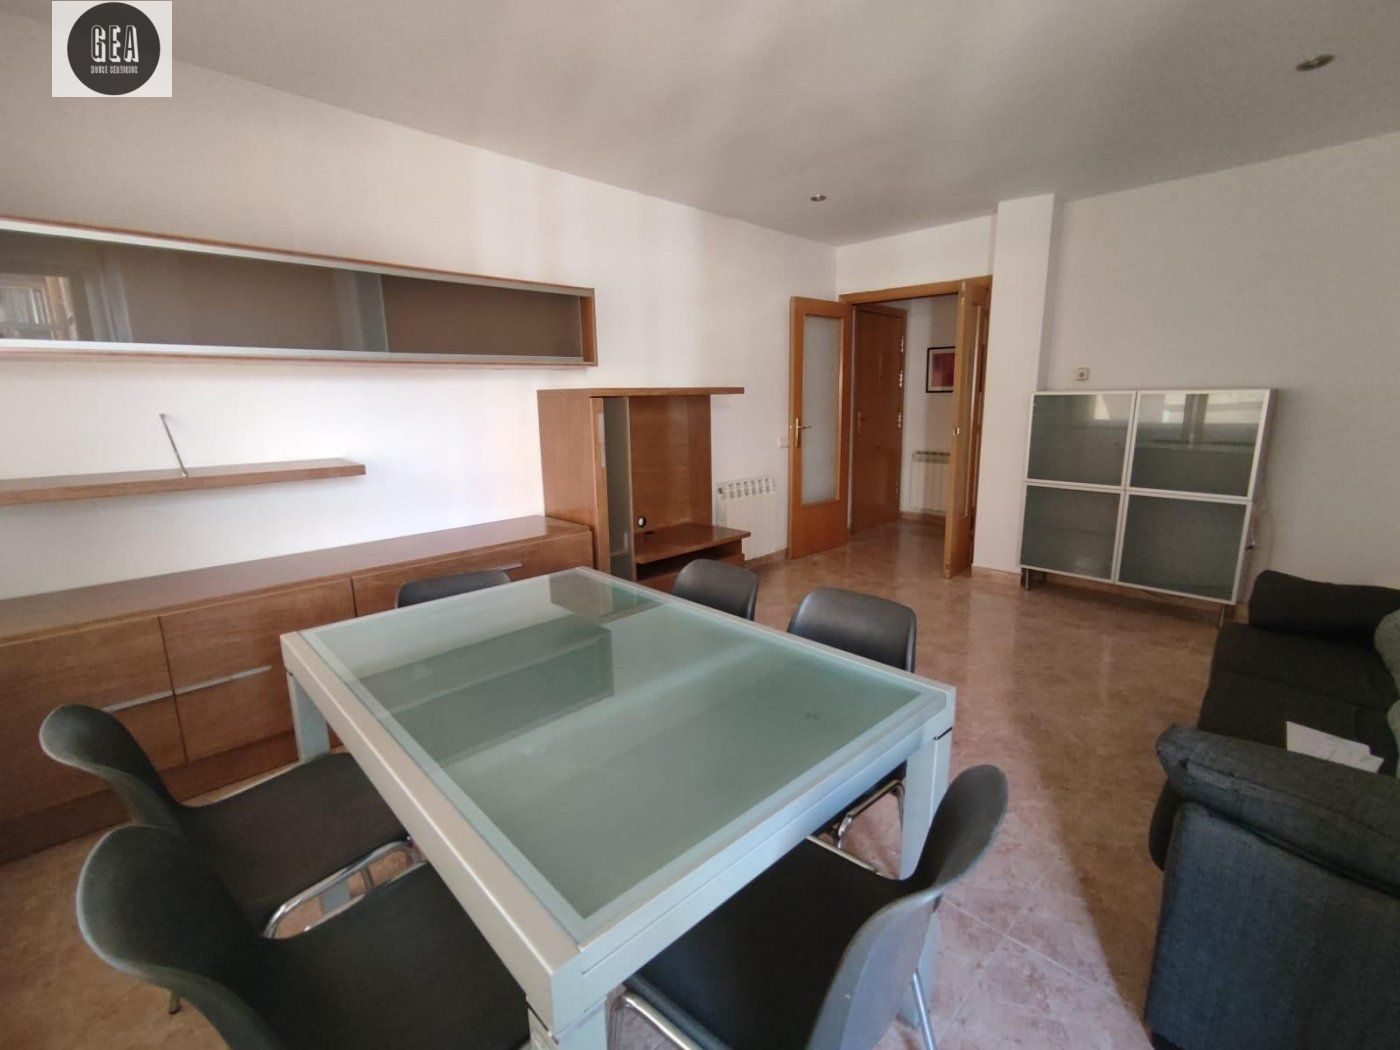 Apartamento, BORDETA, Alquiler/Asignación - Lleida (Lleida)